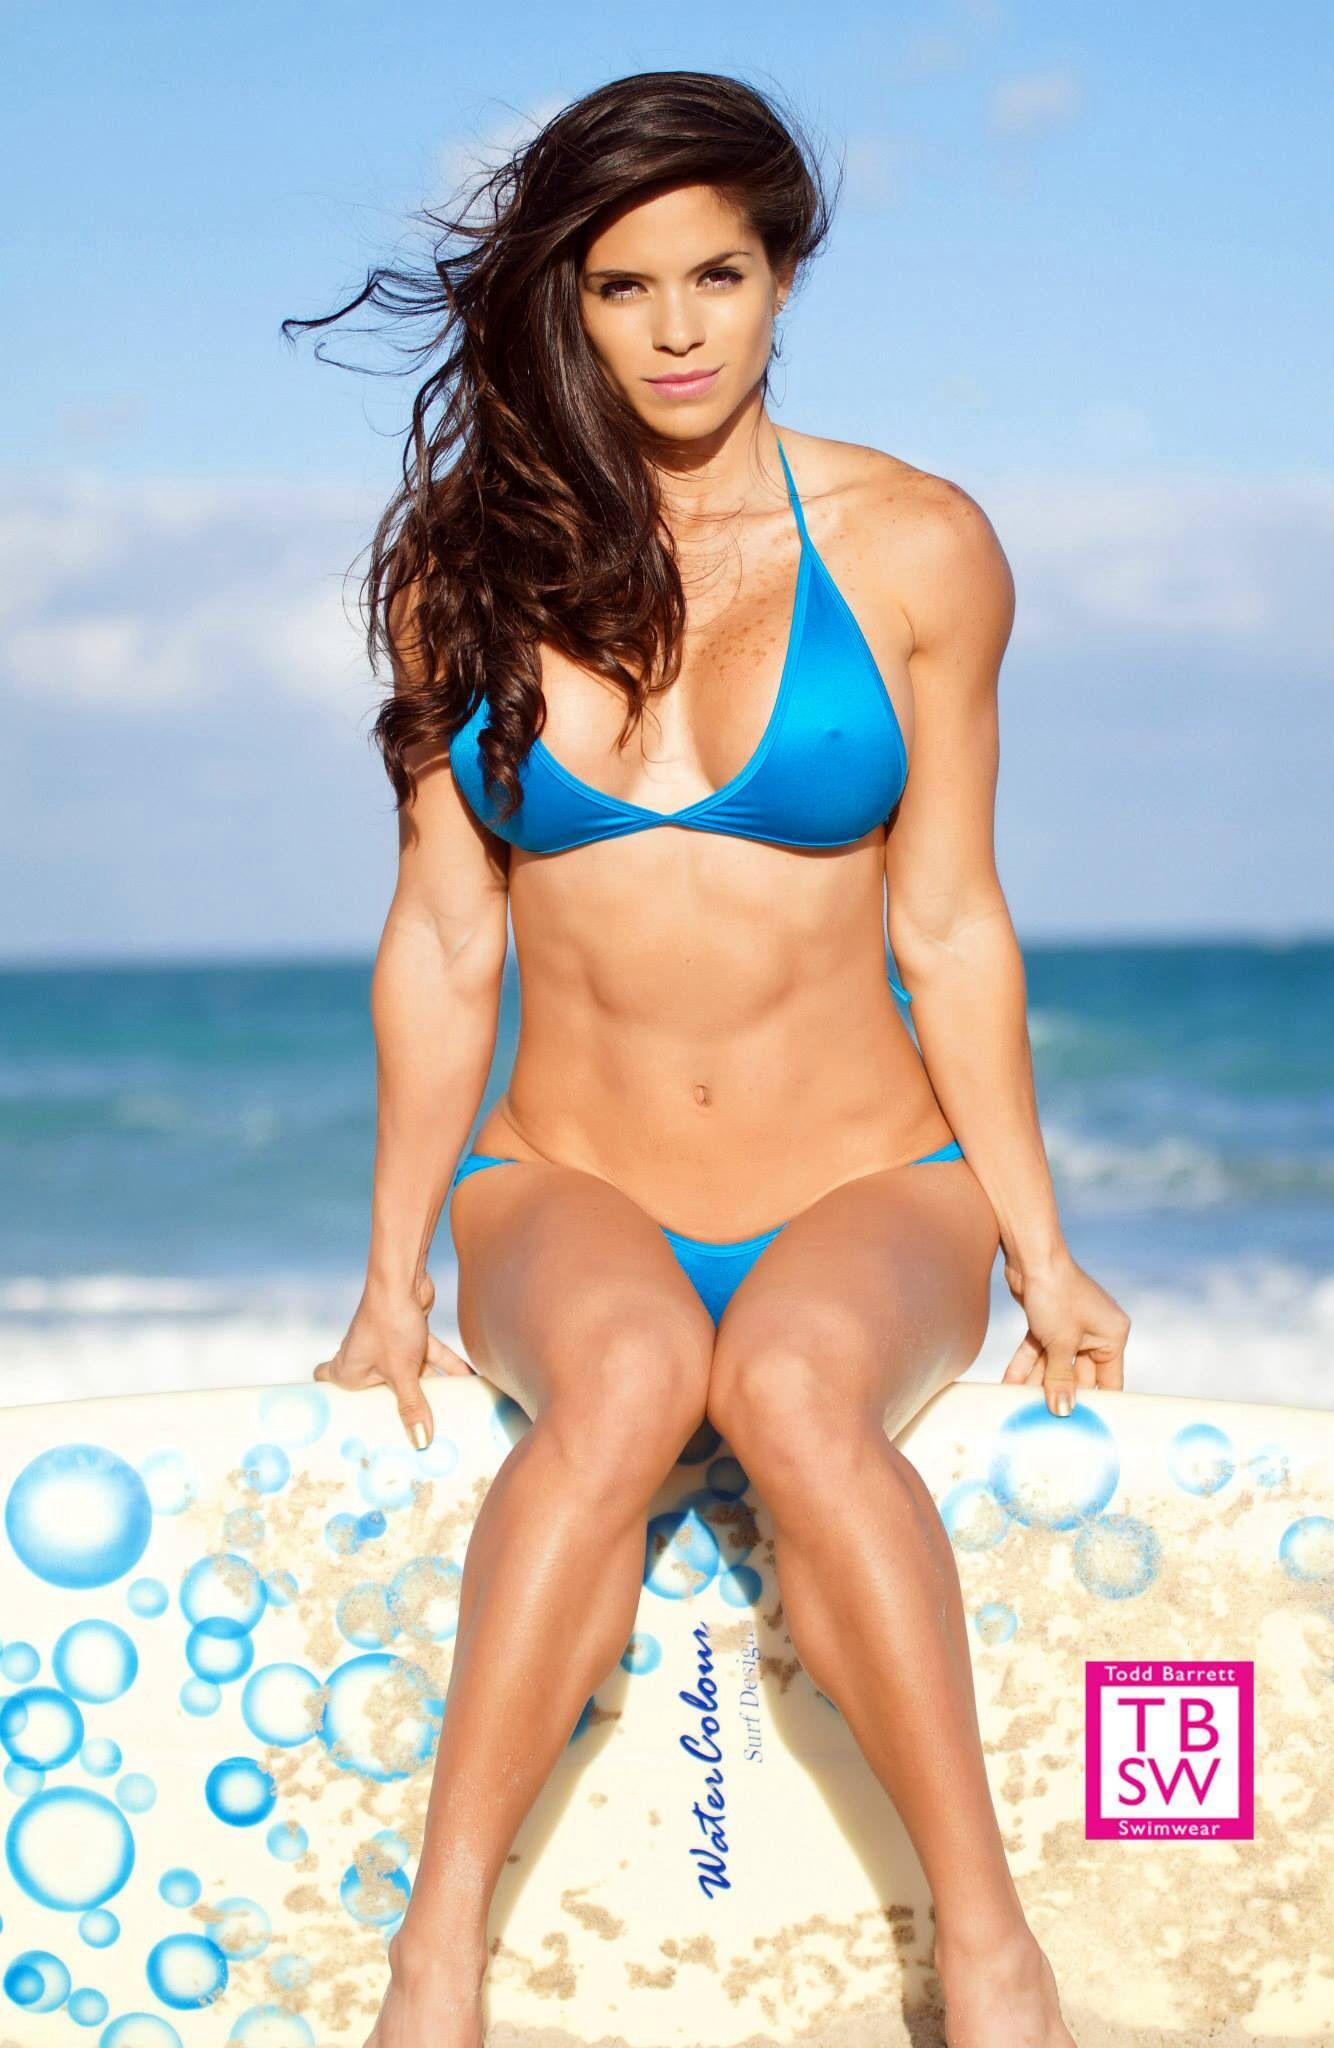 Bikini Gina Barrett nudes (14 foto and video), Ass, Fappening, Feet, lingerie 2020